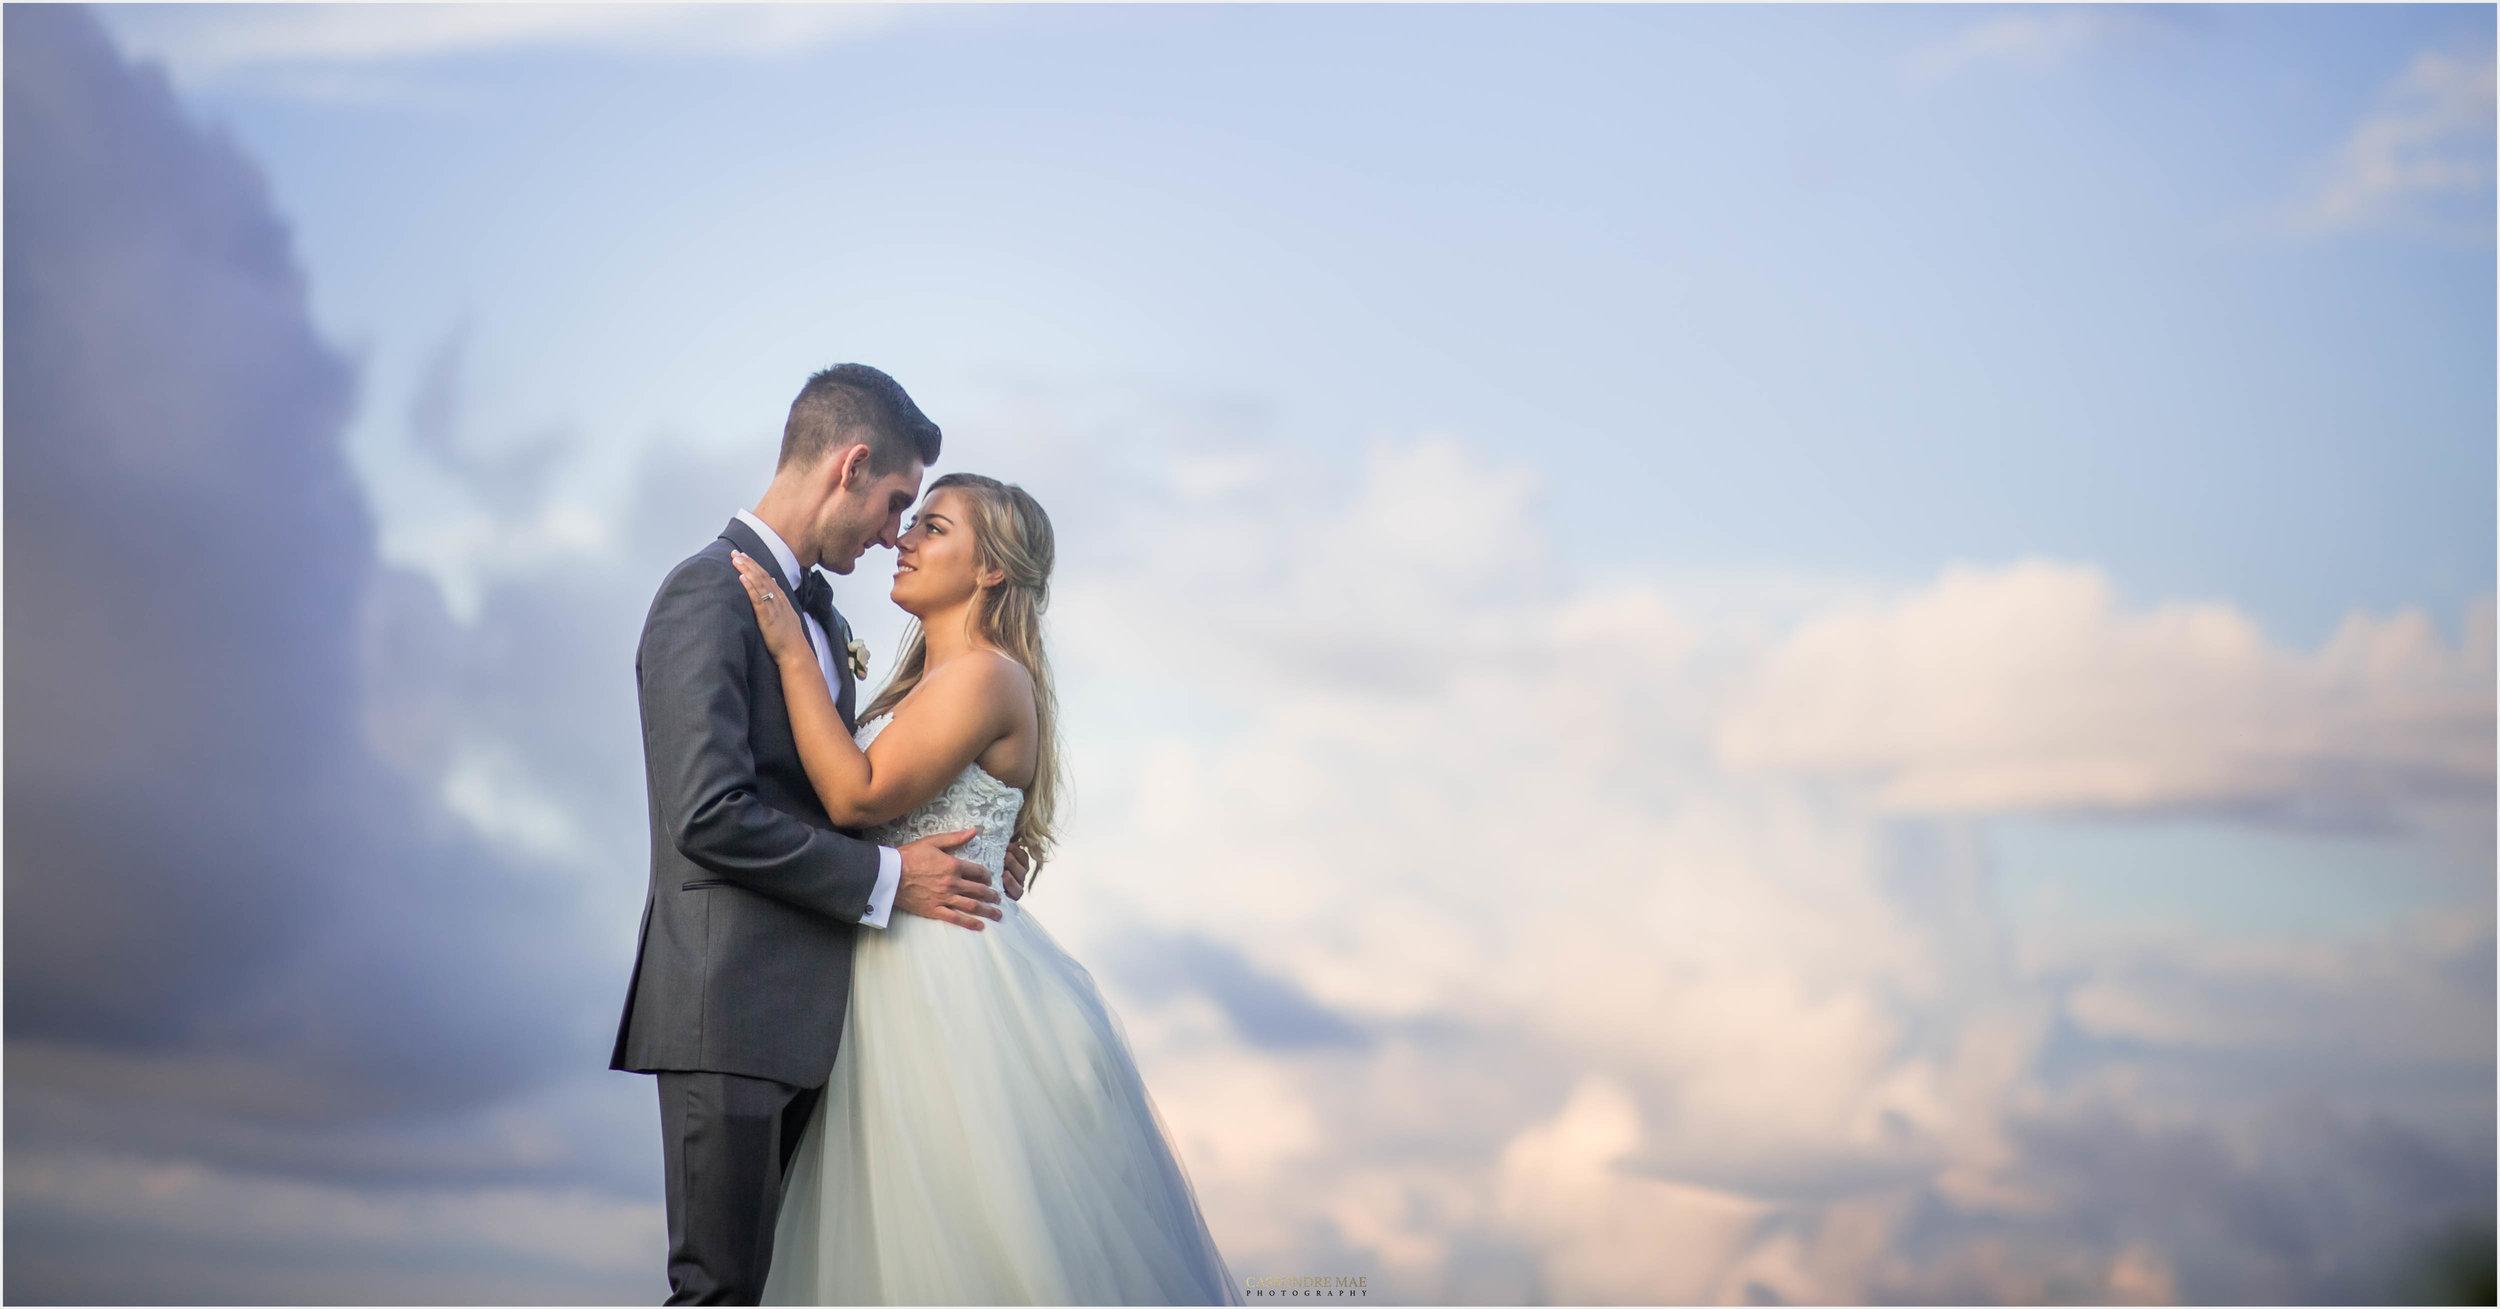 Cassondre Mae Photography Hudson Valley NY Wedding Photographer -21.jpg